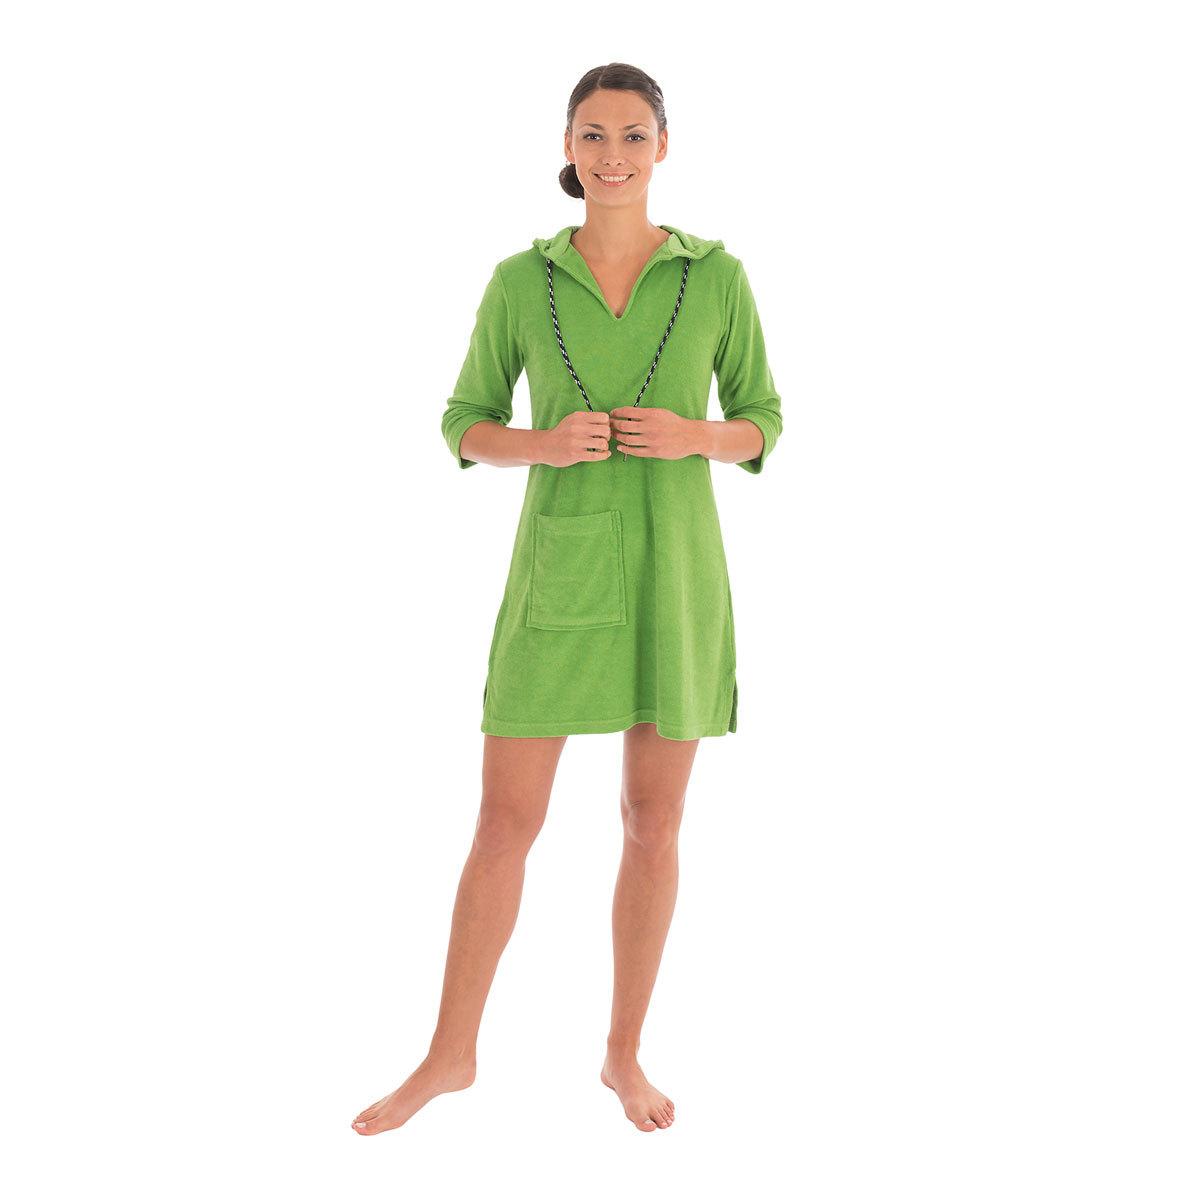 wewo fashion Damen Badekleid 036